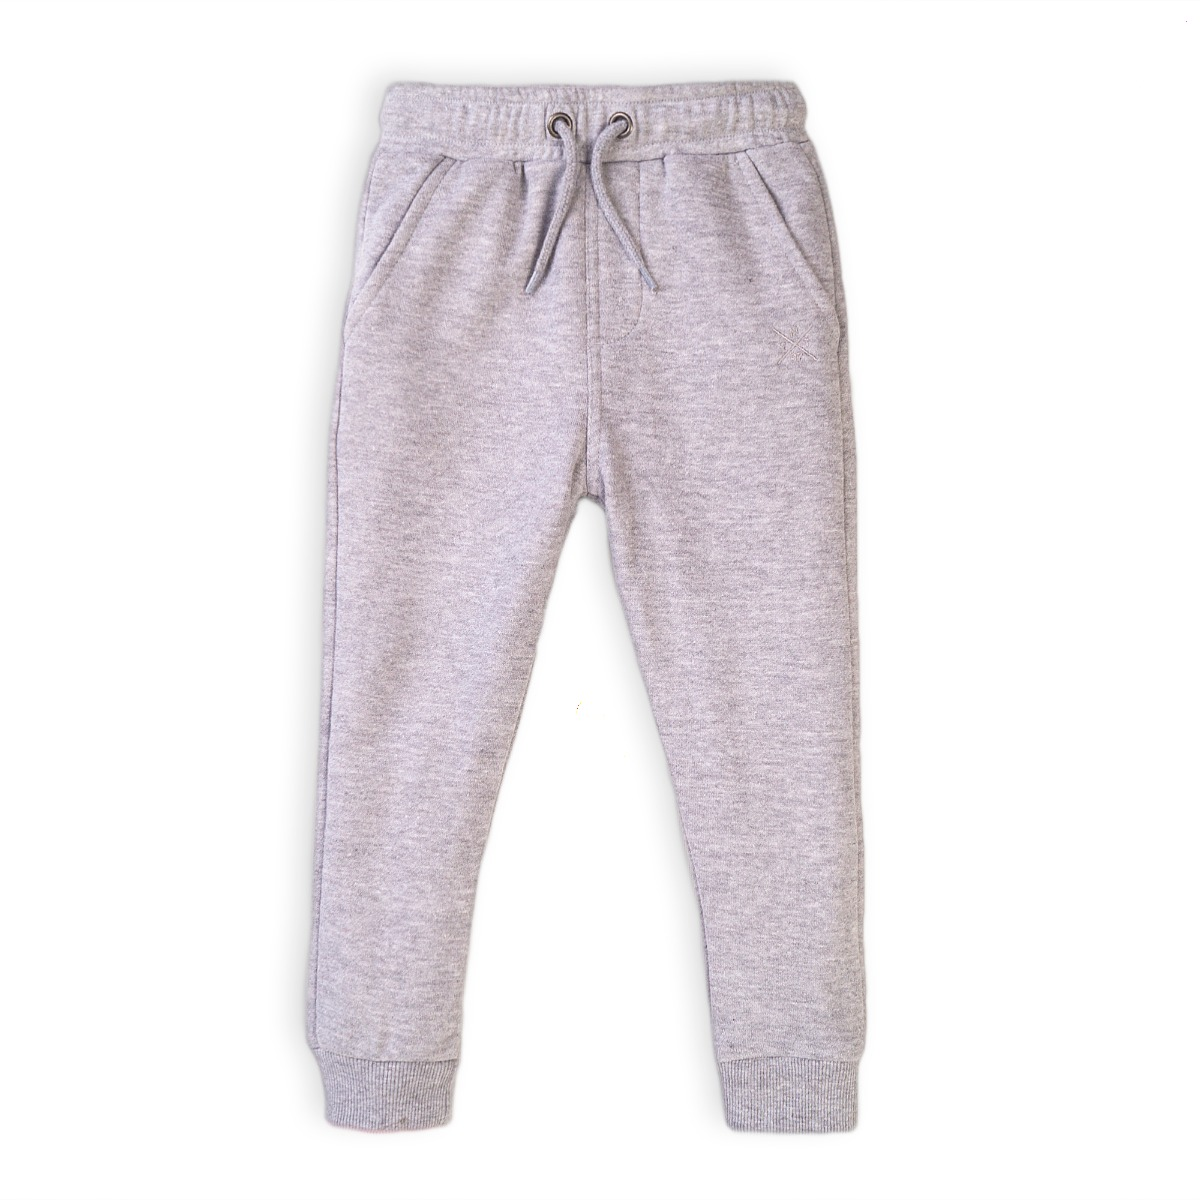 Pantaloni sport cu banda elastica si snur Minoti 5fjog